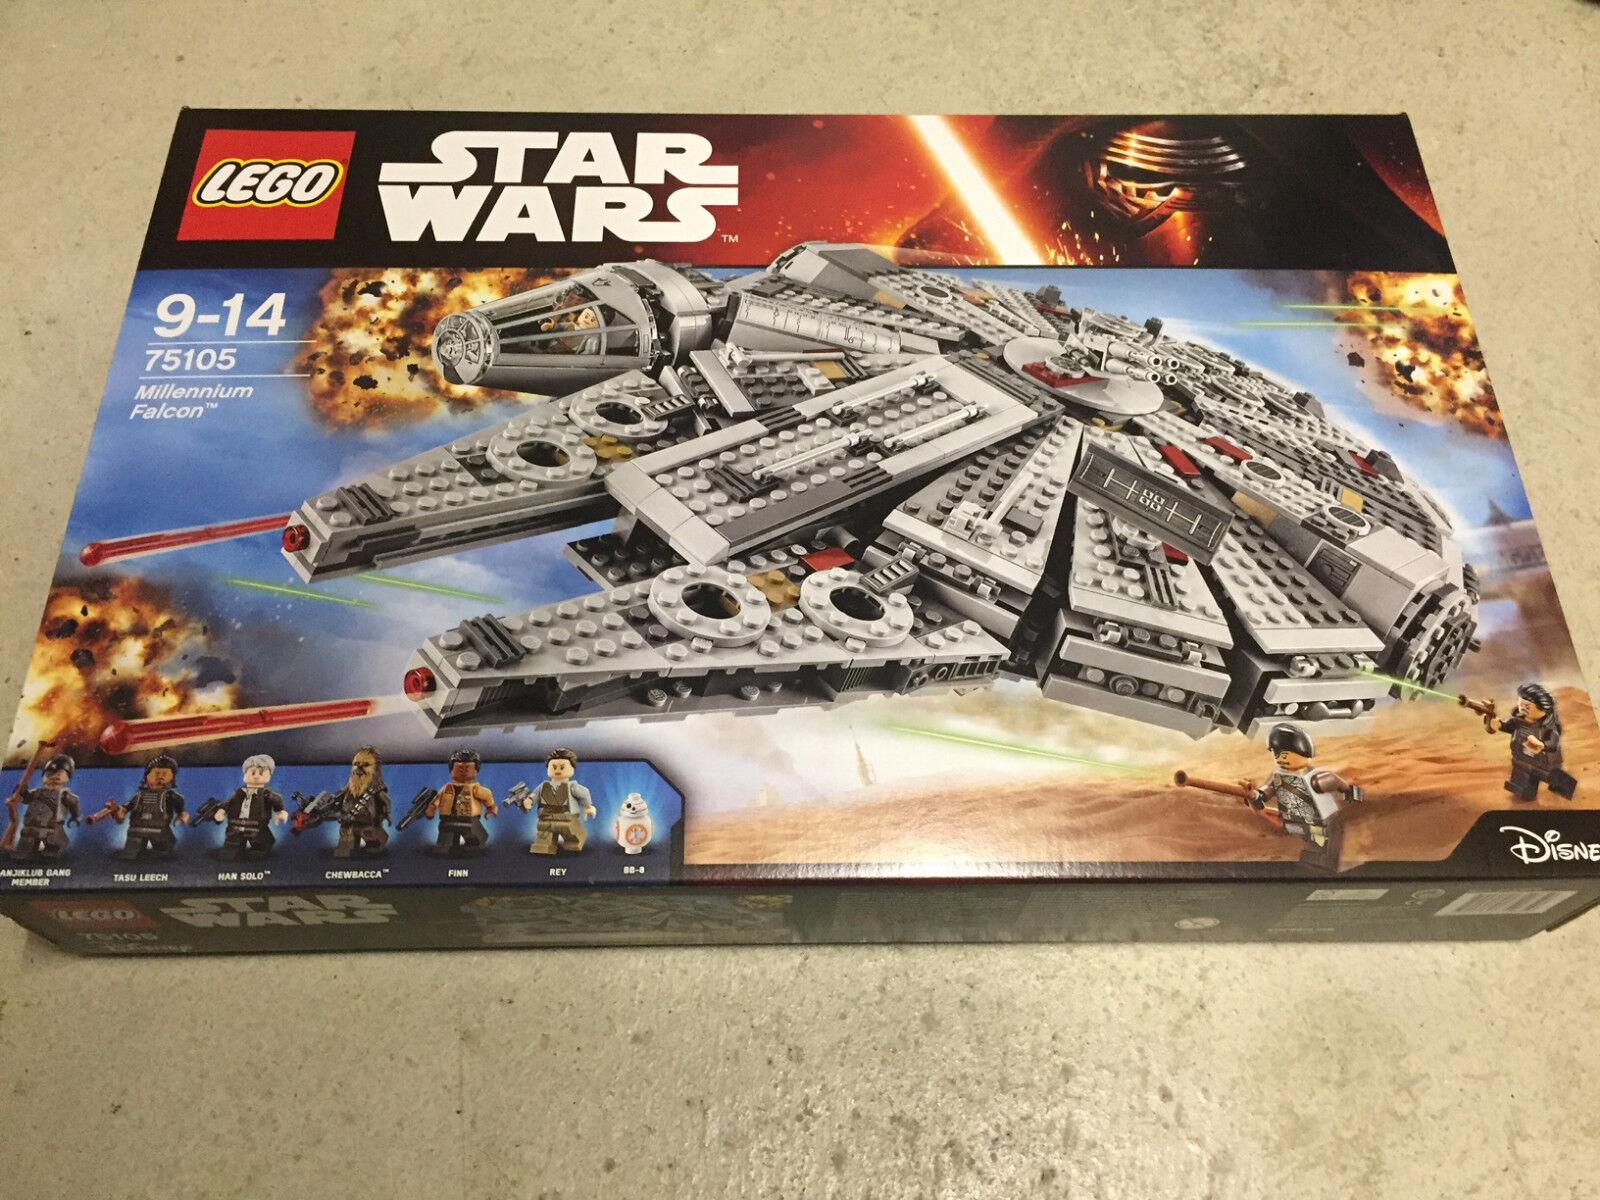 LEGO Star Wars 75105 - Millenium Falcon NEU